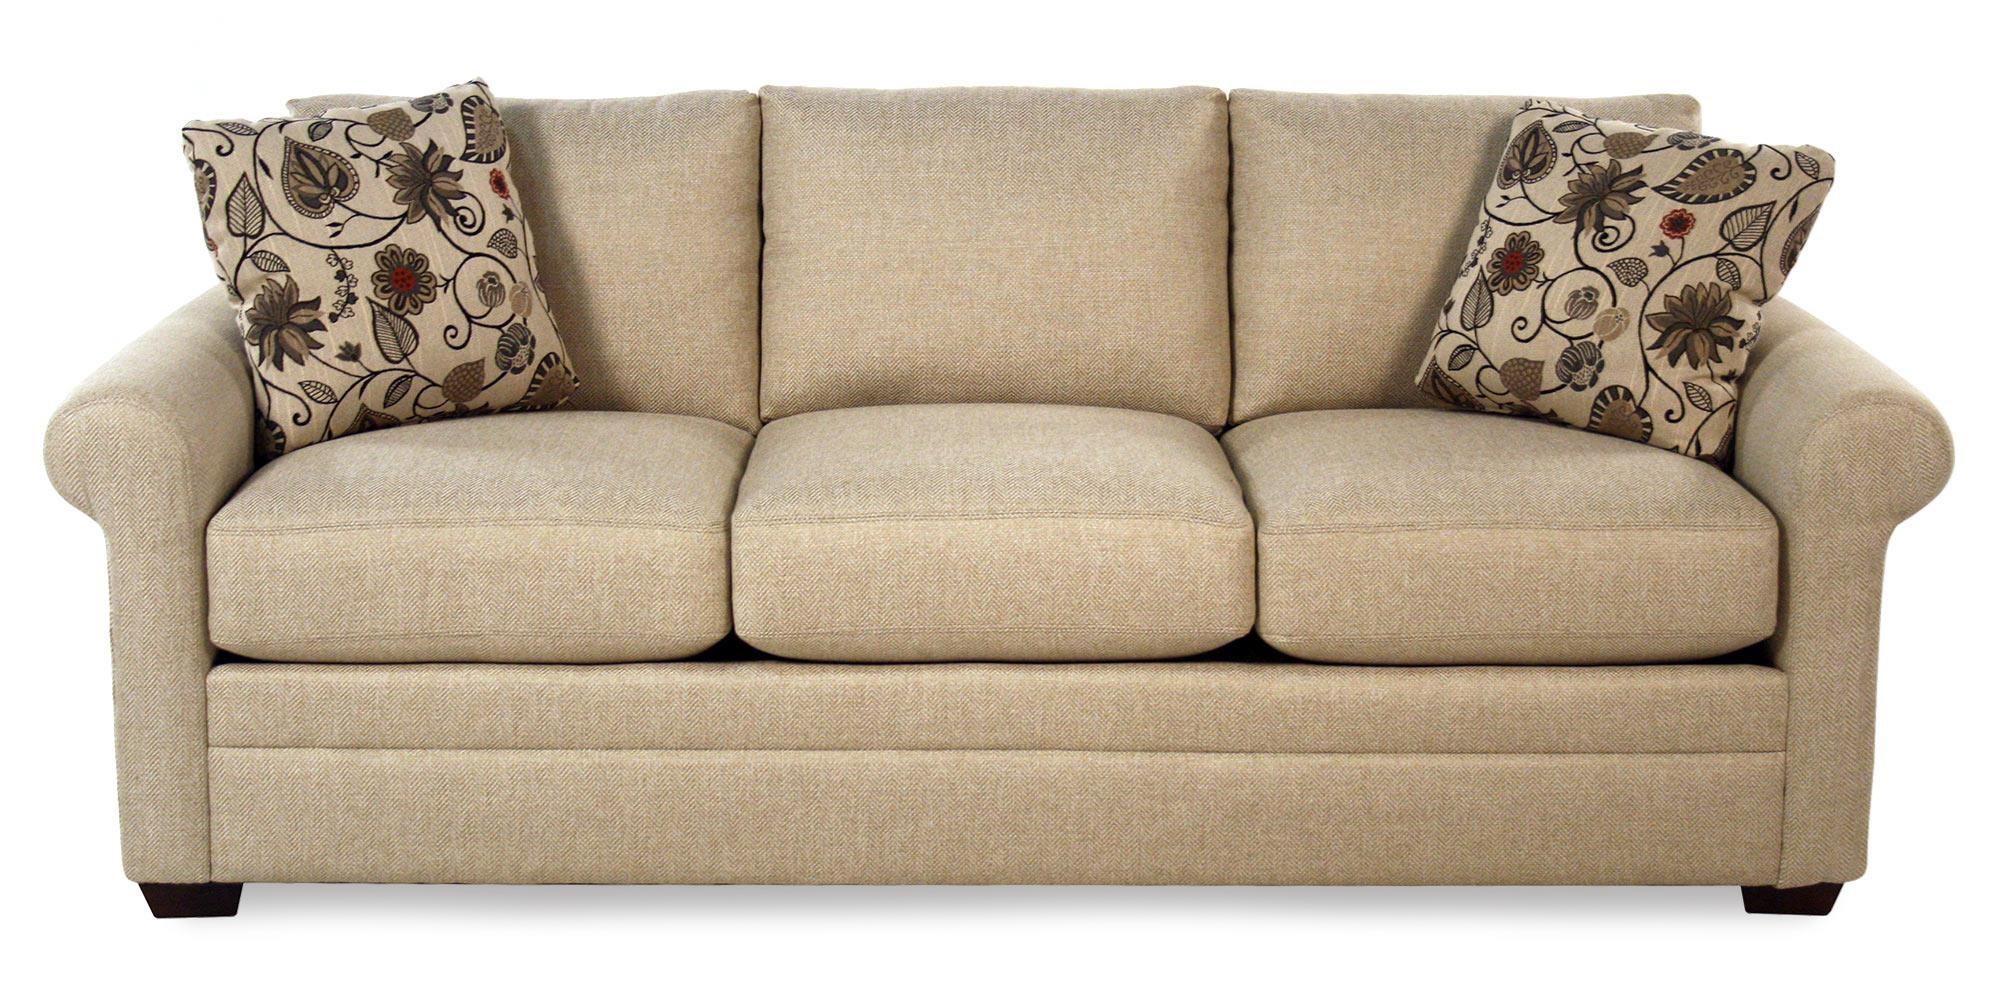 Cozy Life F9 Custom Collection <b>Custom</b> Sofa - Item Number: F921350-ROMERO10